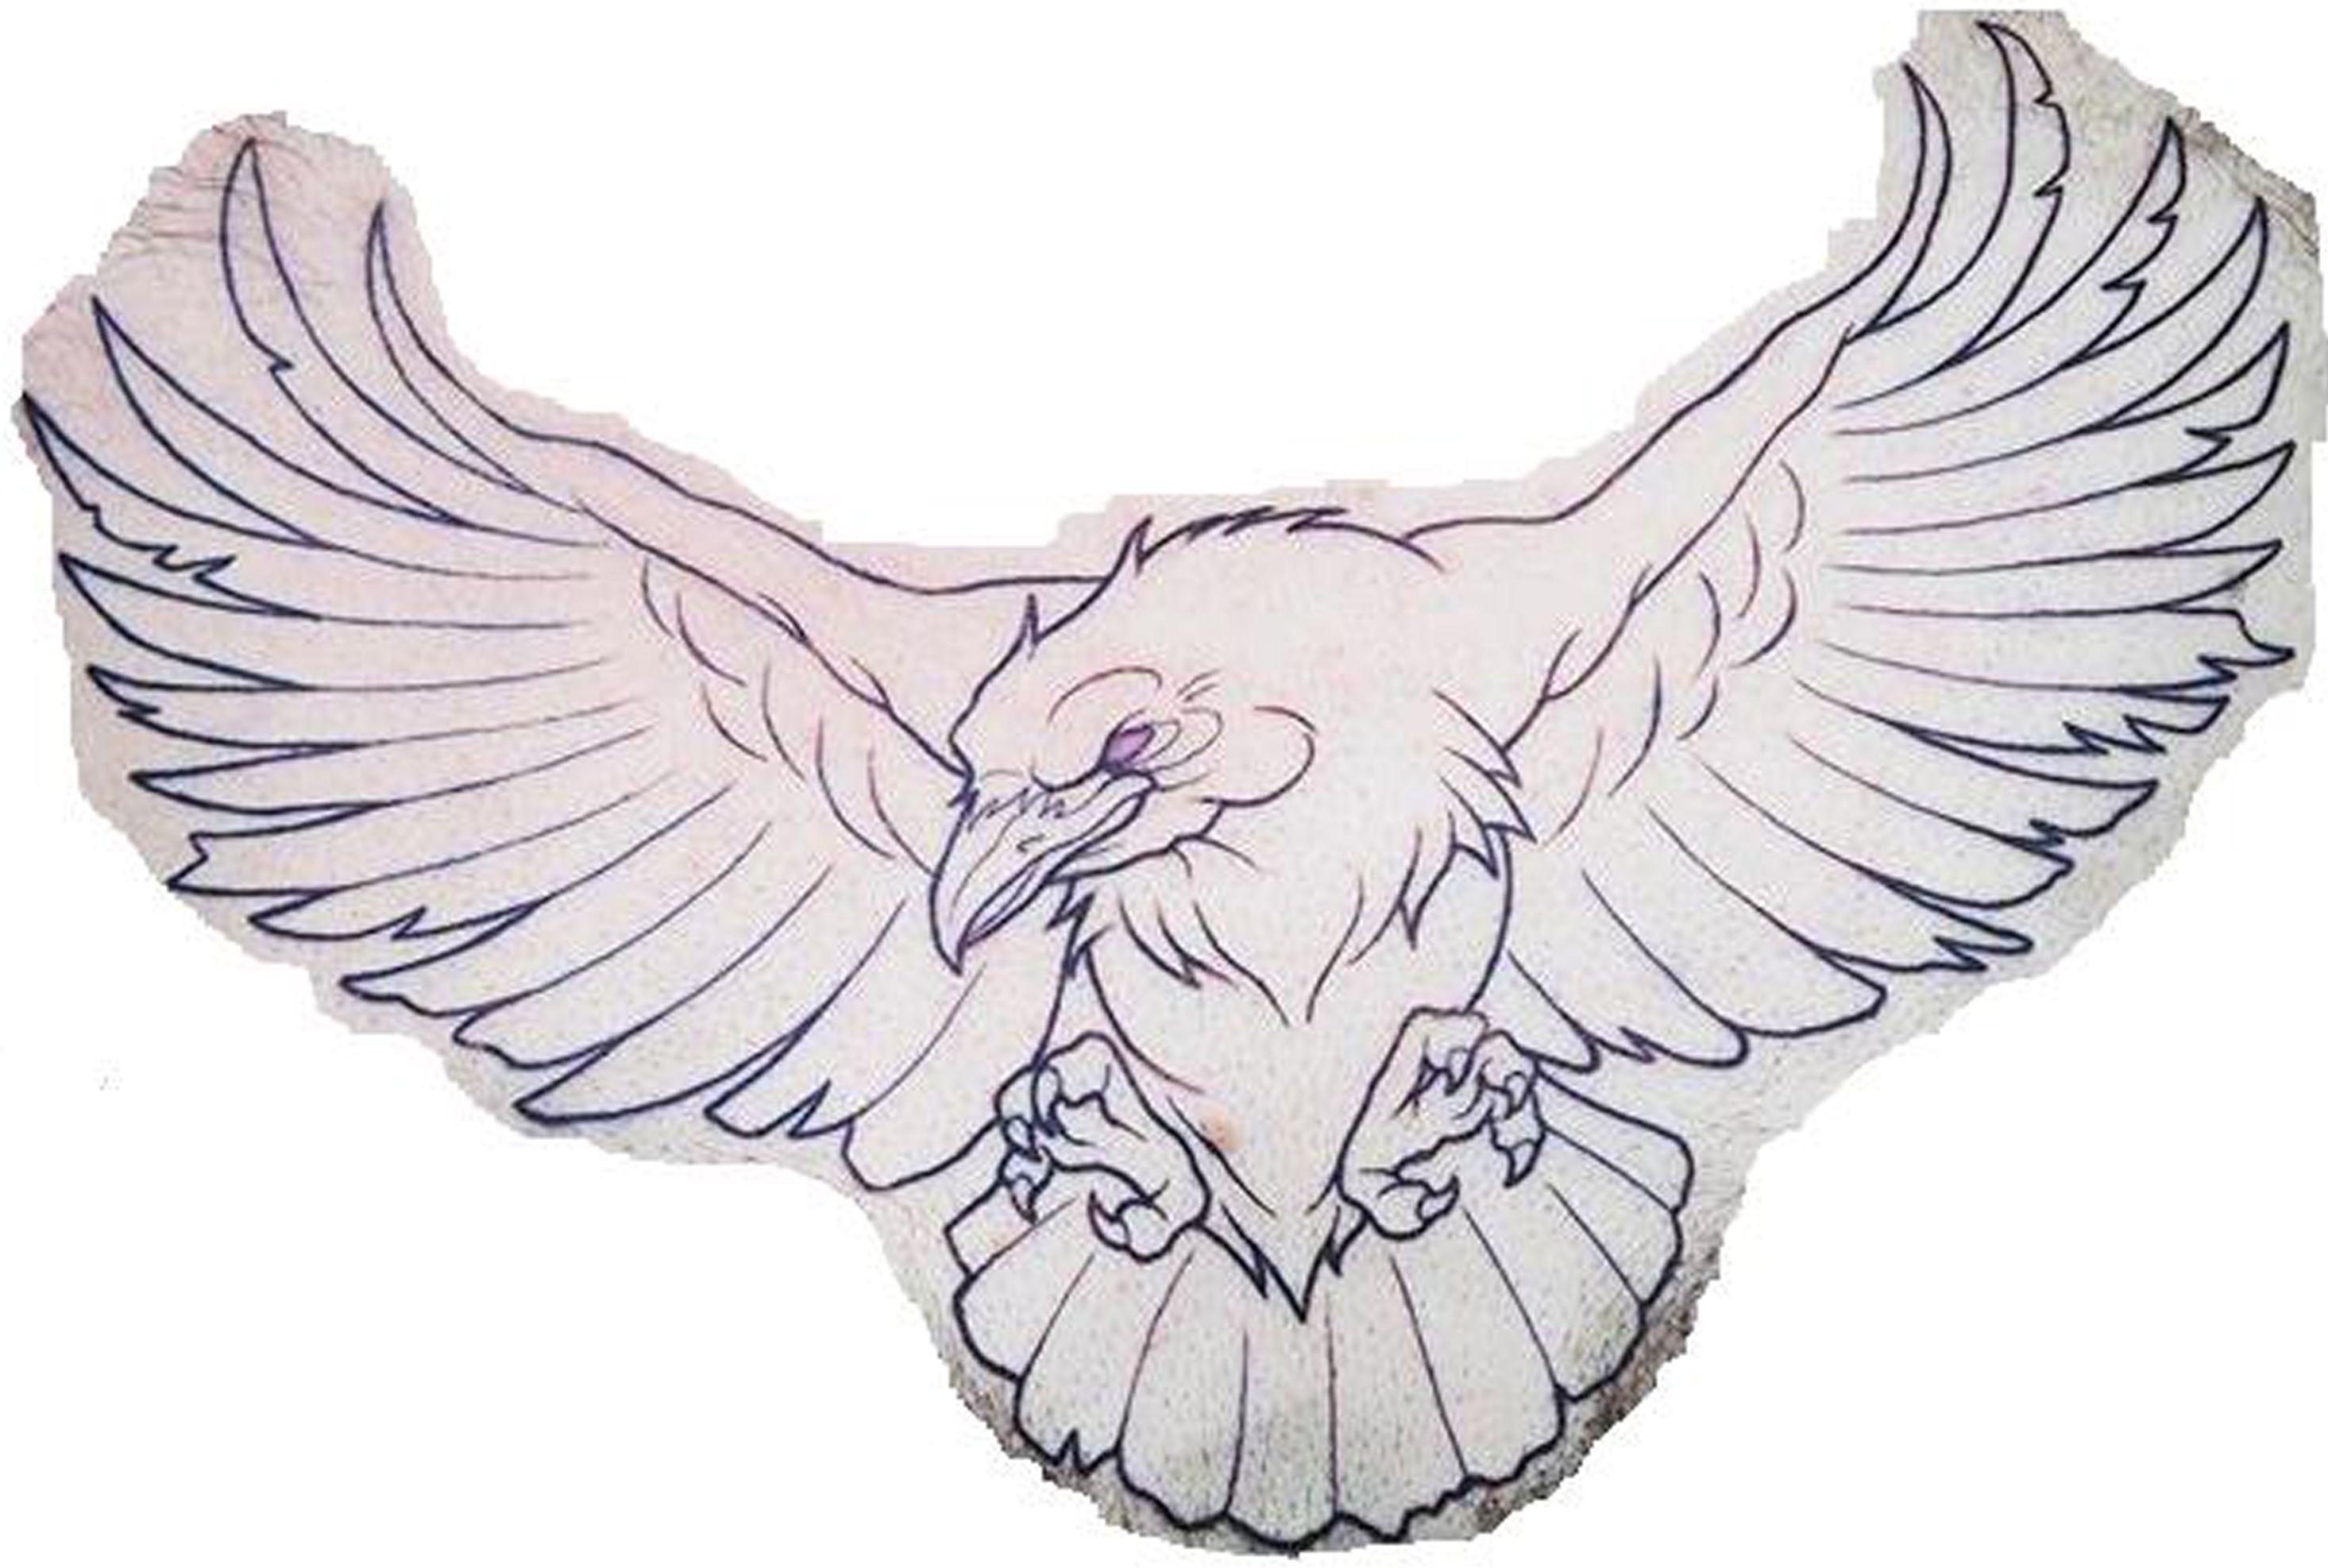 Aguila Feather Tattoos Tattoo Sketches Bird Sketch